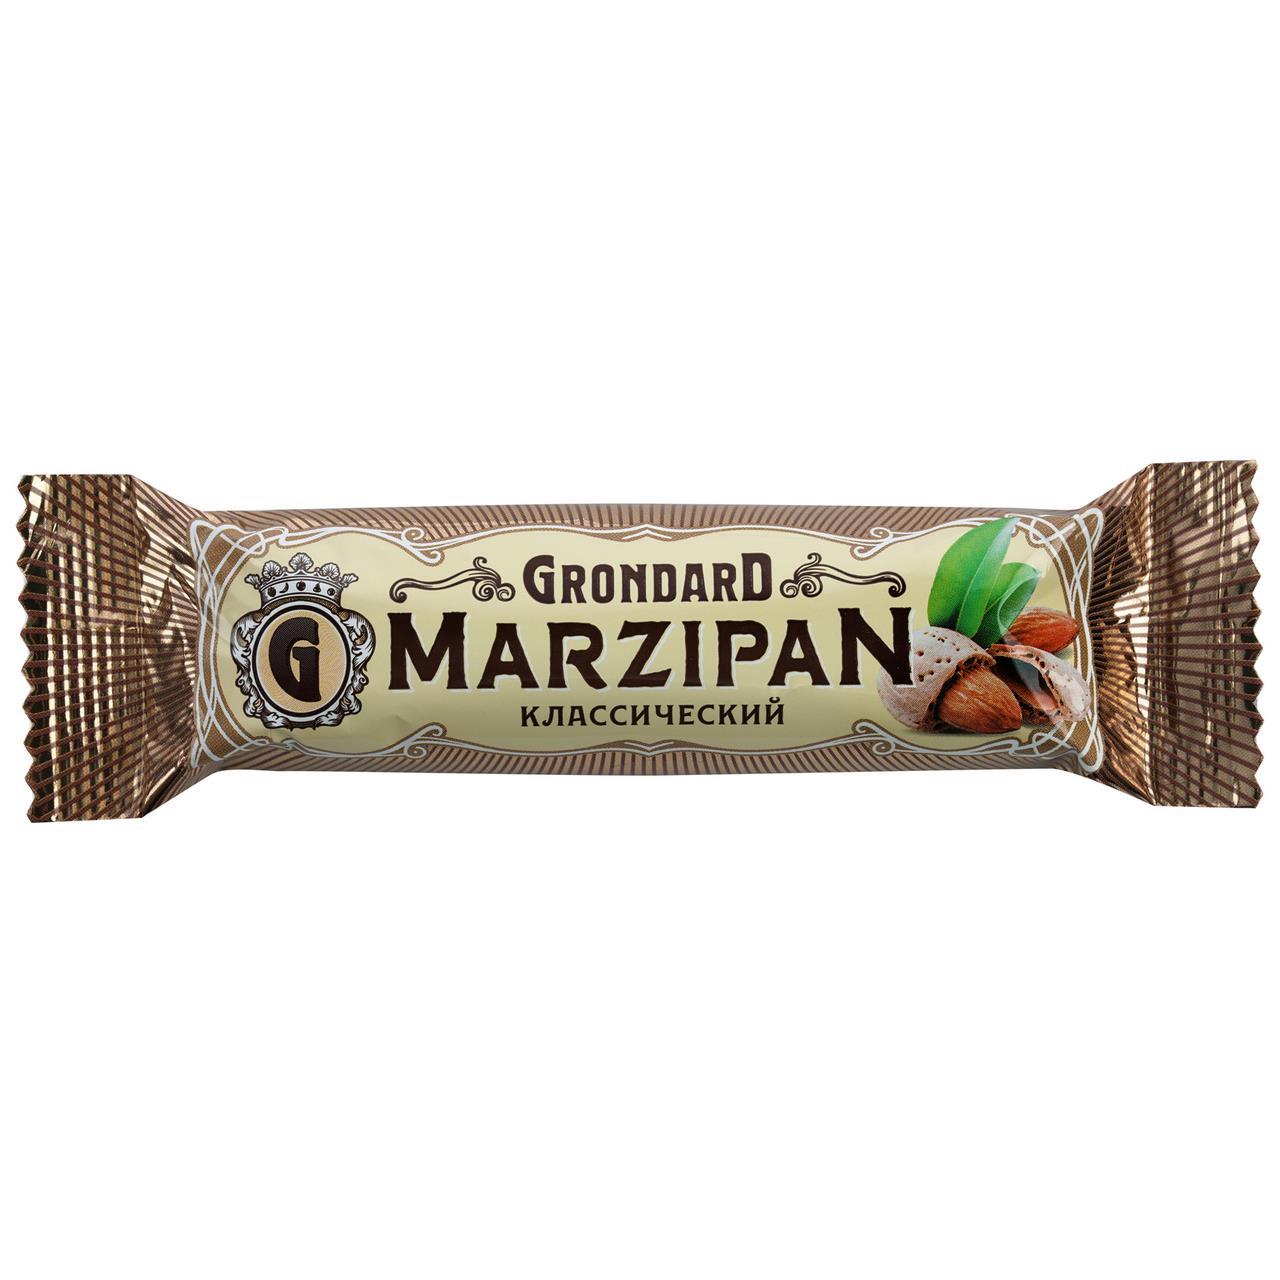 Батончик GRONDARD Marzipan классический, 50г